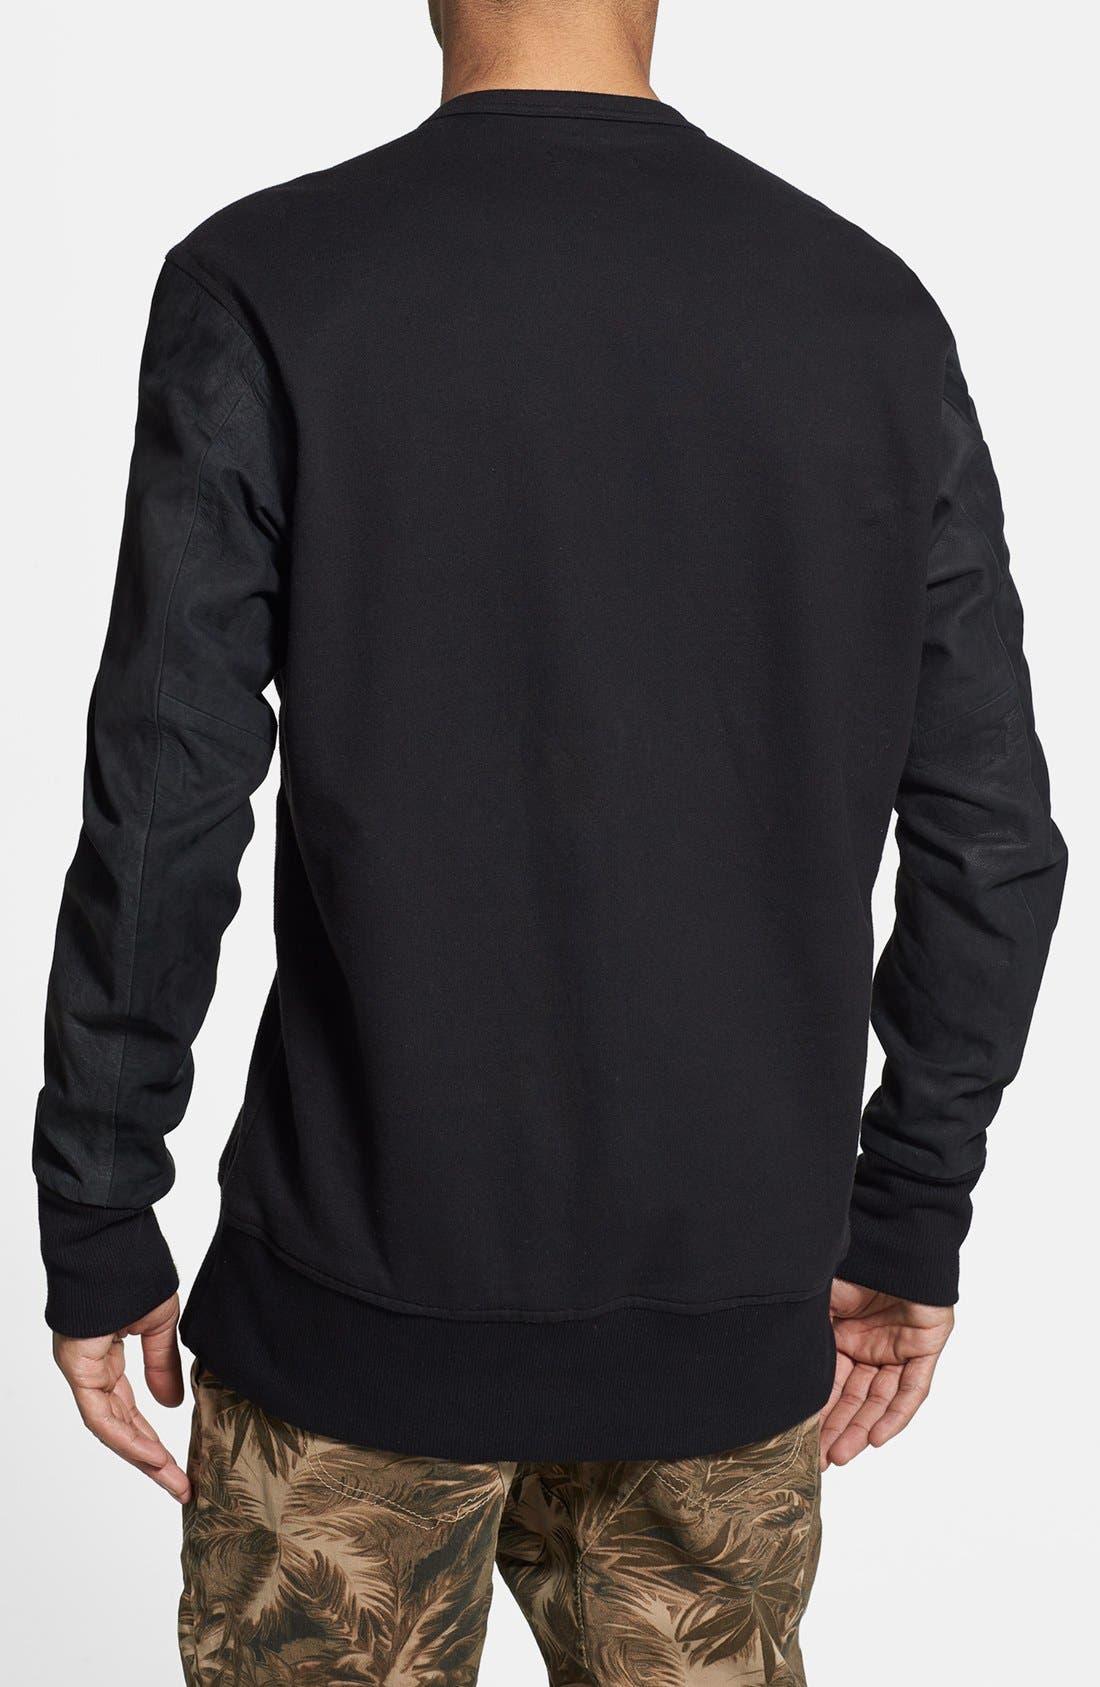 Alternate Image 2  - ZANEROBE 'Primal' Crewneck Sweatshirt with Suede Sleeves